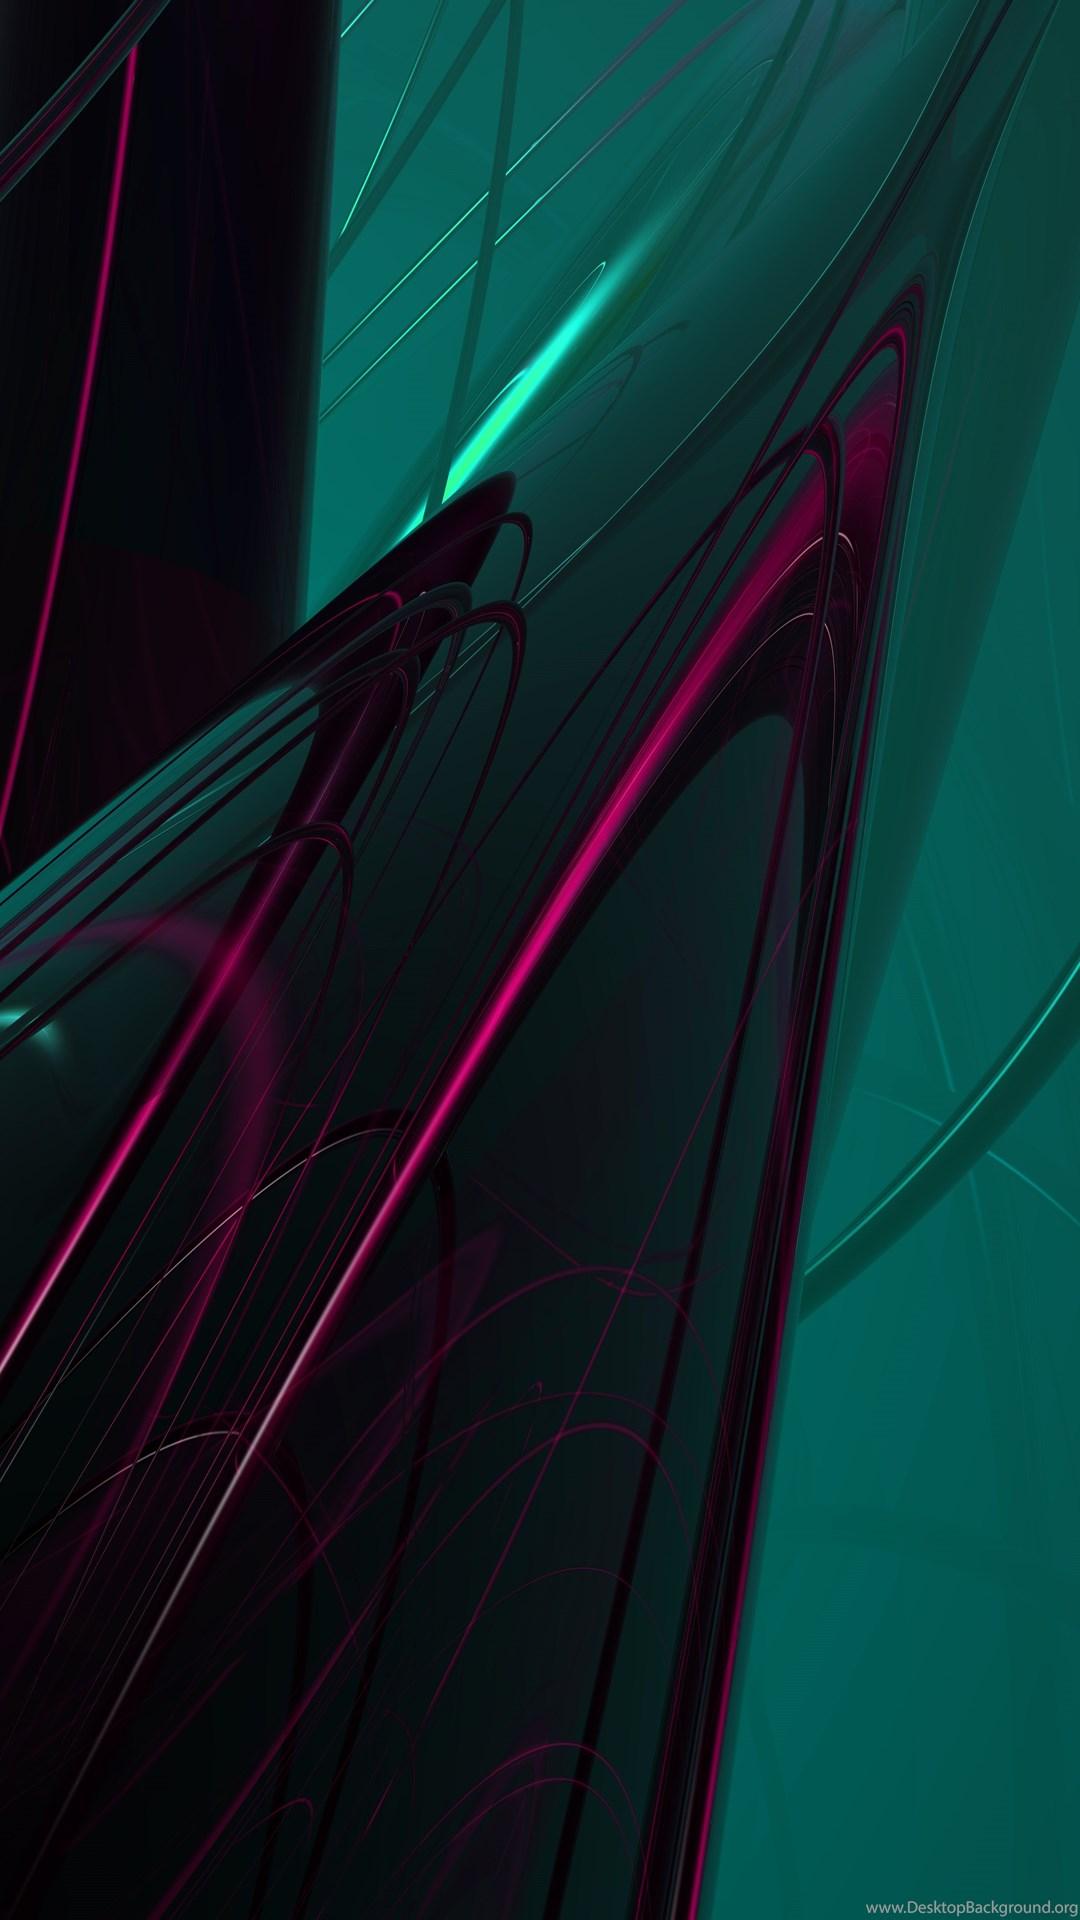 8k abstract wallpaper,magenta,purple,violet,pink,animation